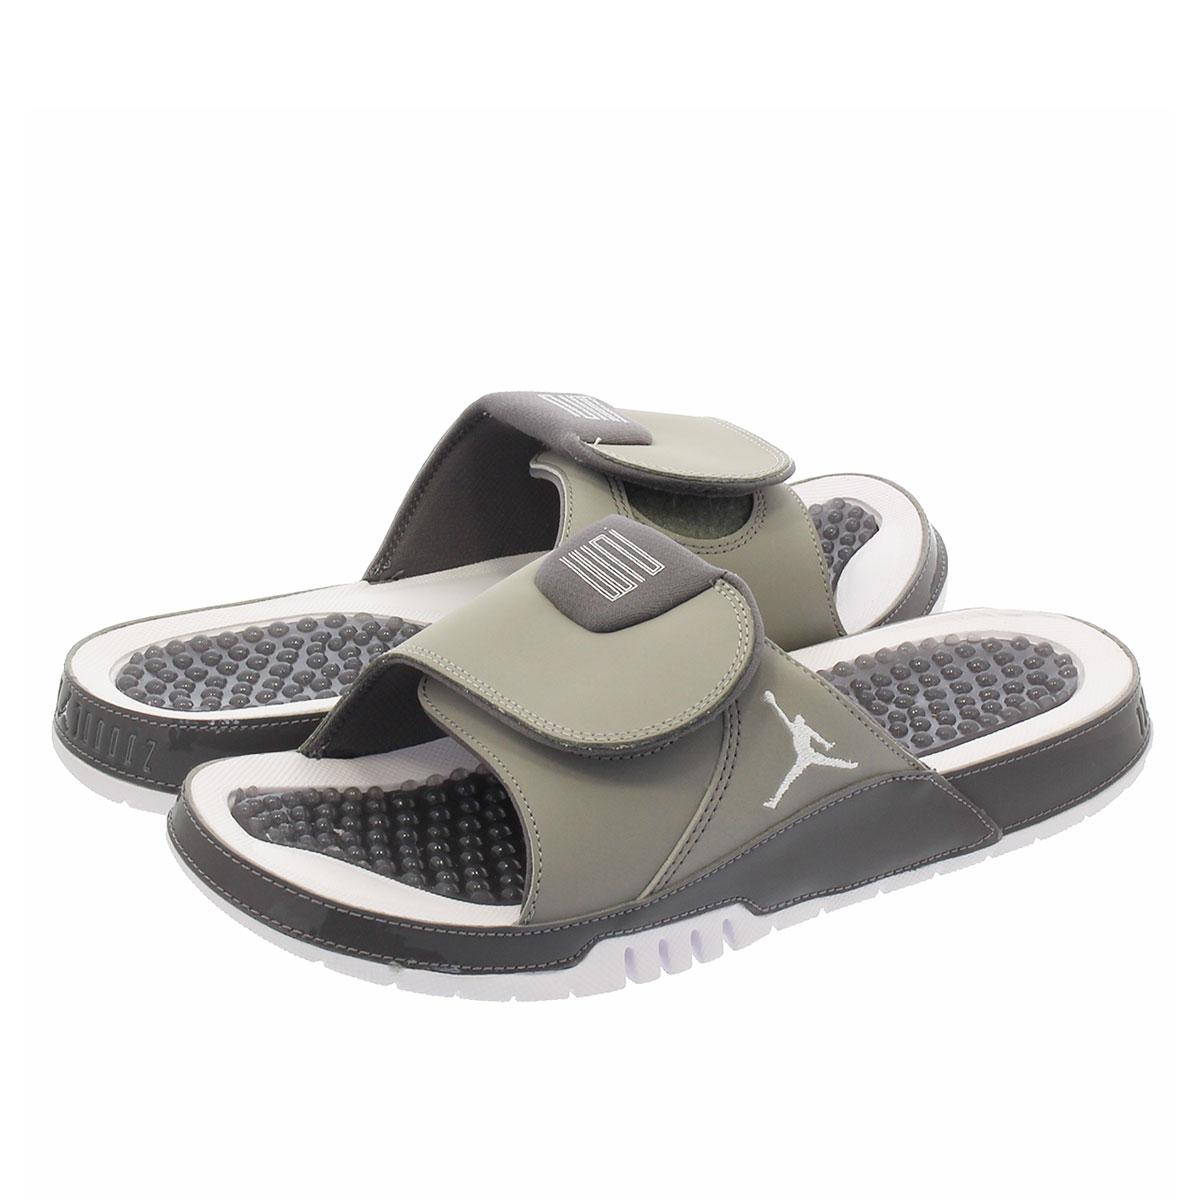 e45e309c8ab816 NIKE JORDAN HYDRO XI RETRO Nike Jordan high mud 11 nostalgic MEDIUM  GREY WHITE GUNSMOKE